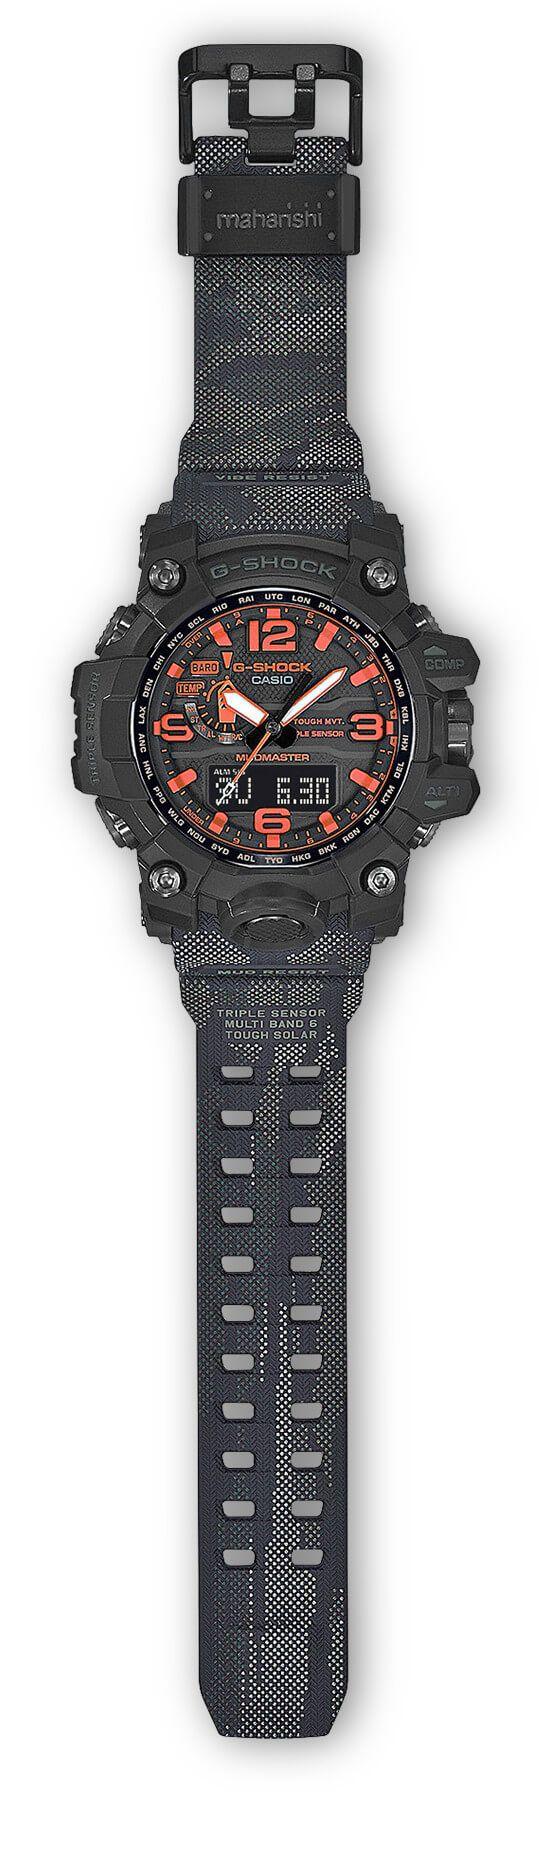 Maharishi X G Shock Mudmaster Gwg 1000mh 1a Casio Watches Original Ga 100 1a4 Jam Tangan Pria Resin Black